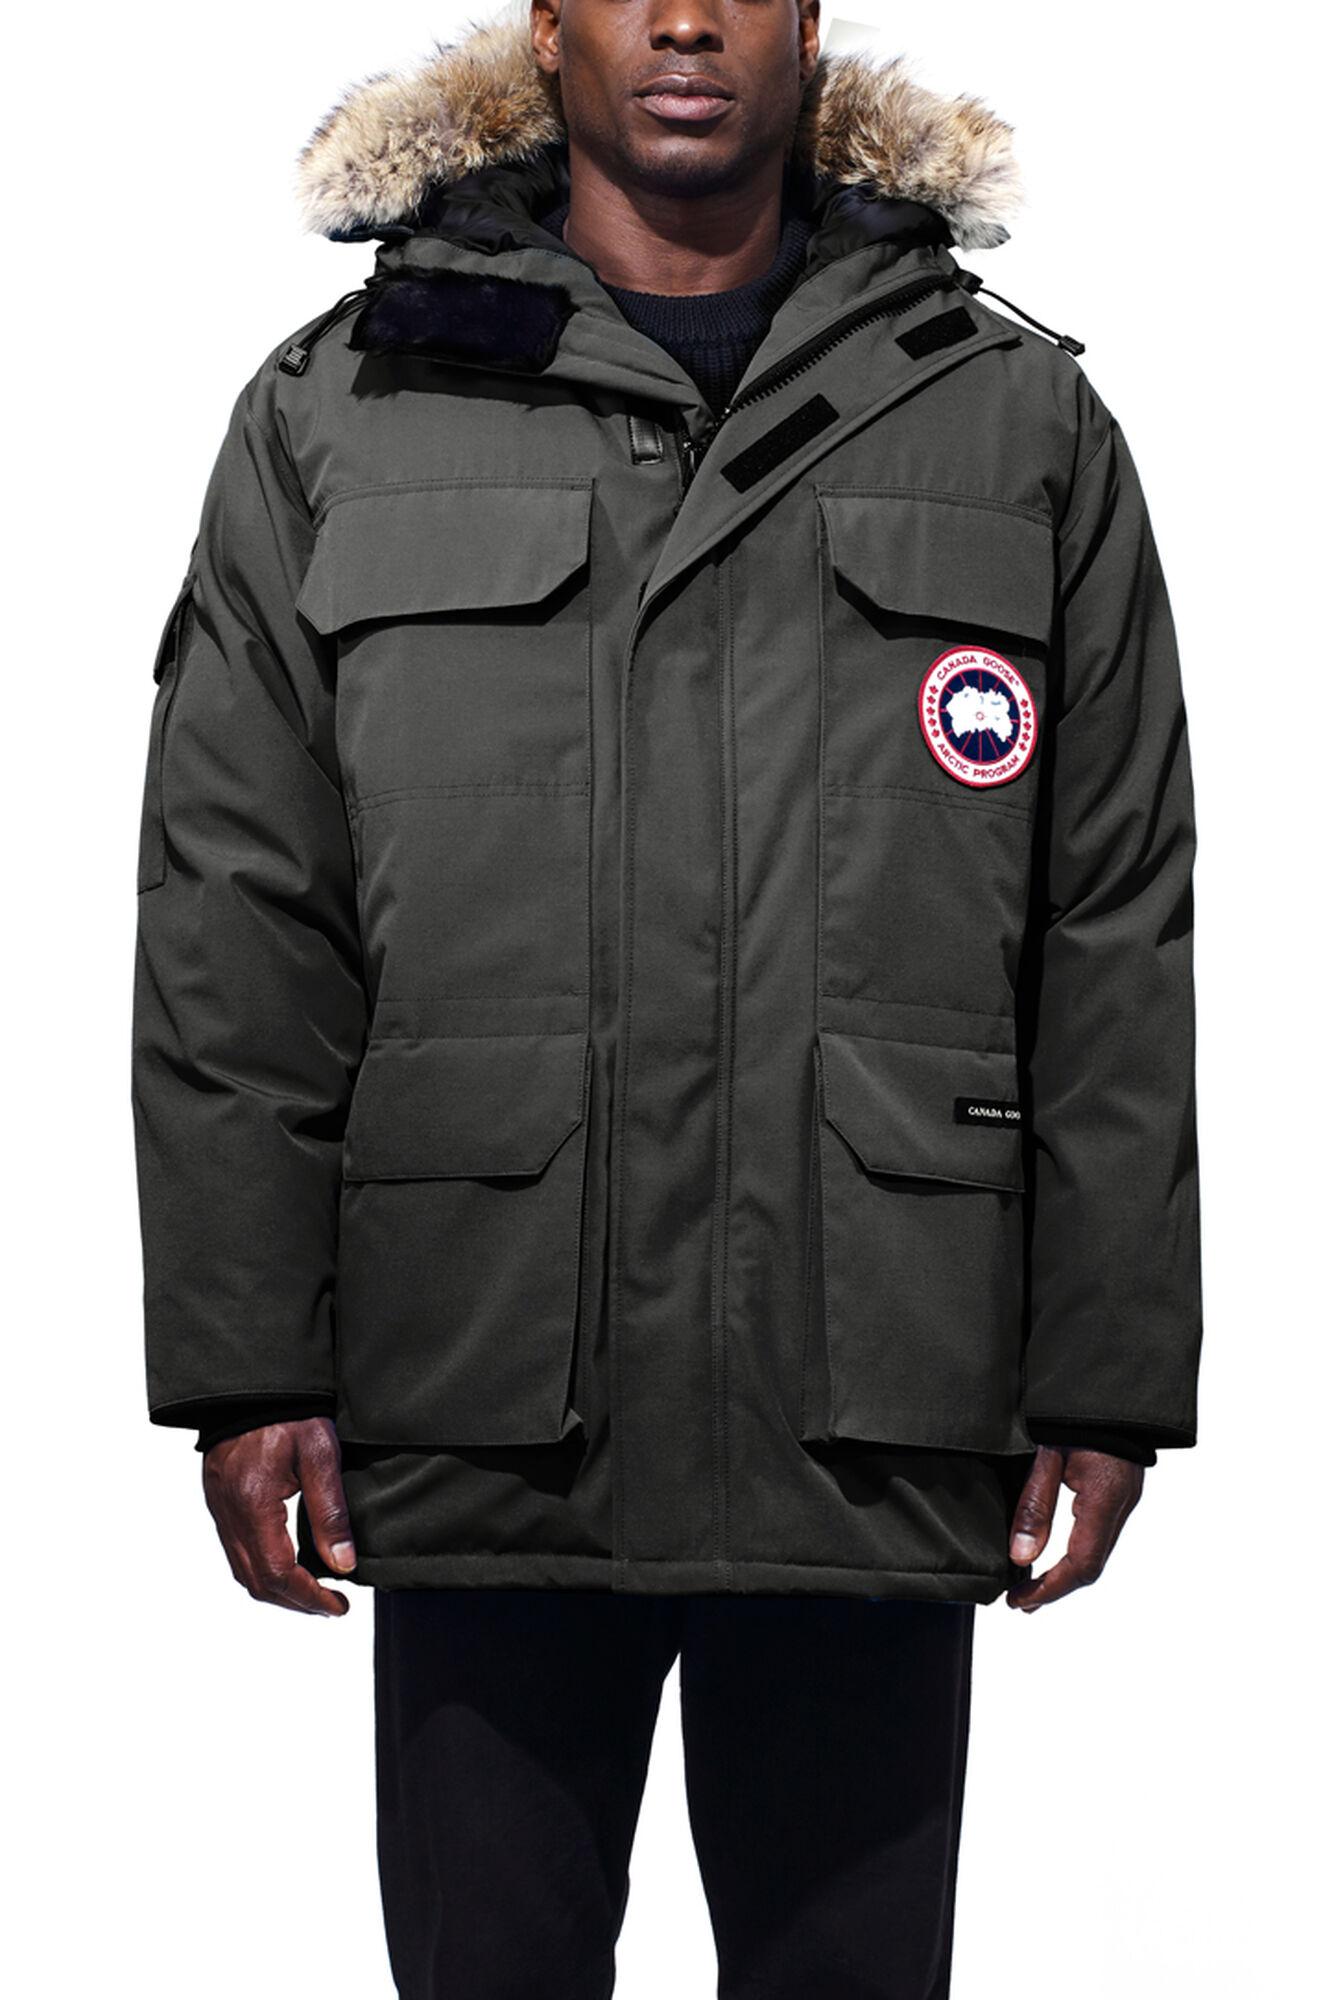 Canada Goose toronto replica store - Men's Arctic Program Expedition Parka | Canada Goose?